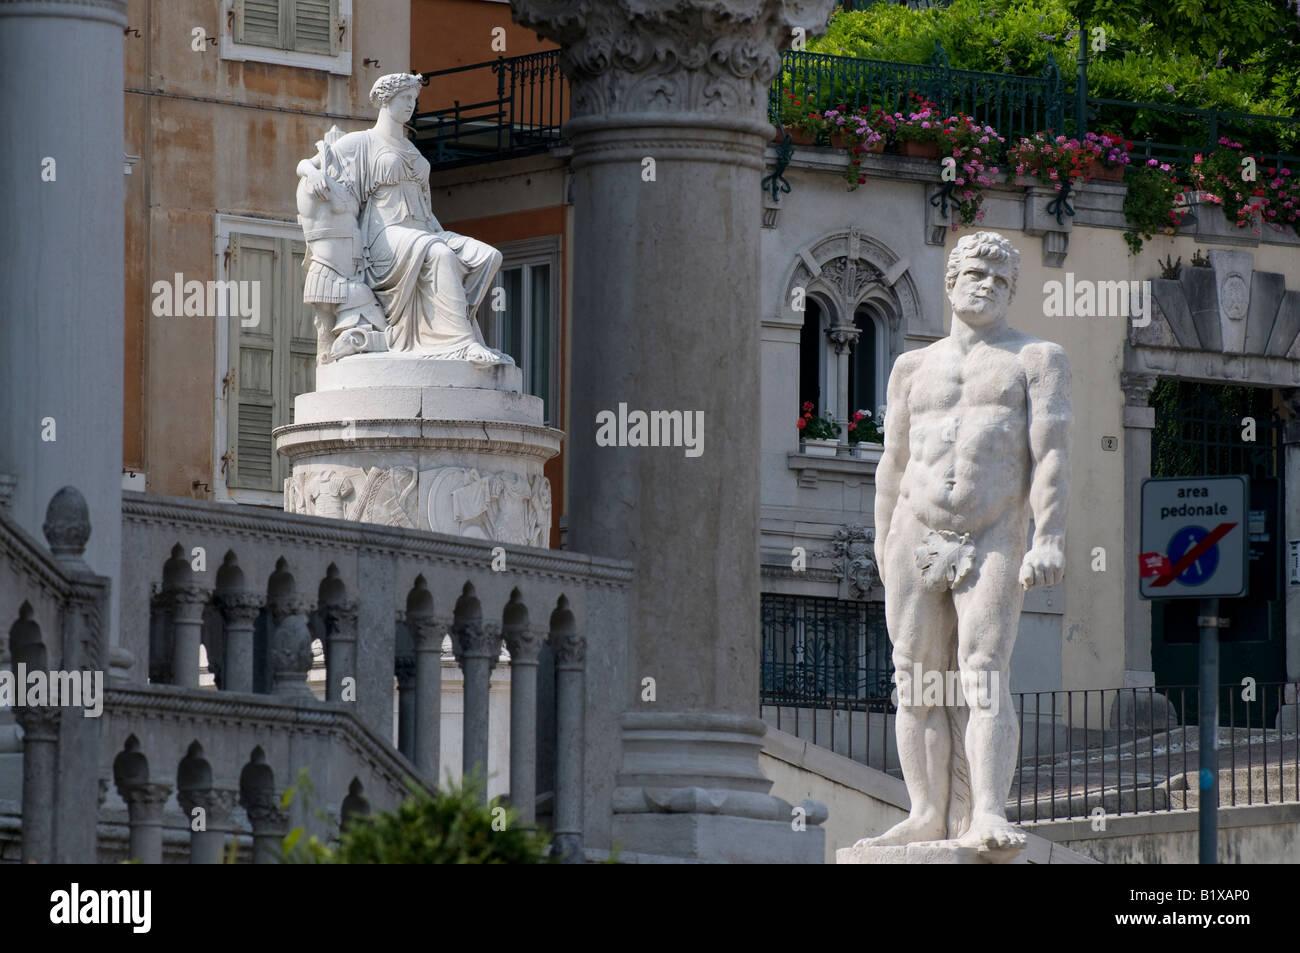 Piazza Liberta square - Udine Friuli Italy - Stock Image